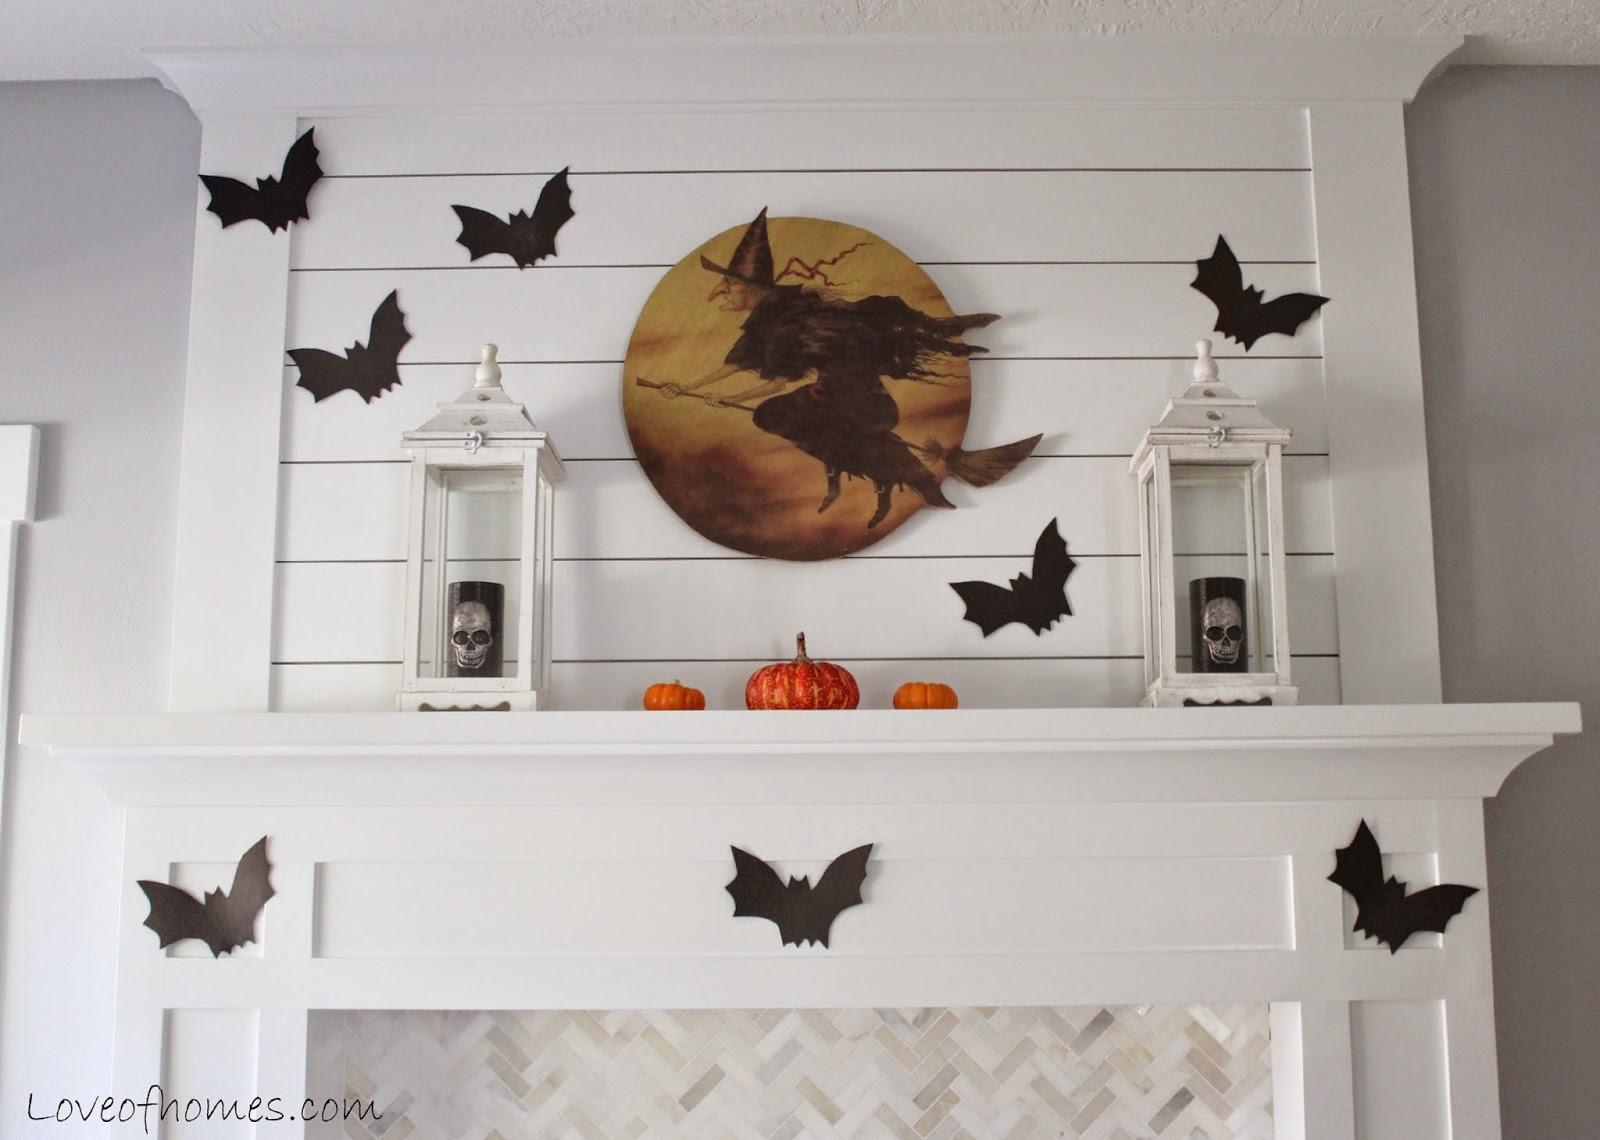 LOVE OF HOMES Halloween Decor 2014